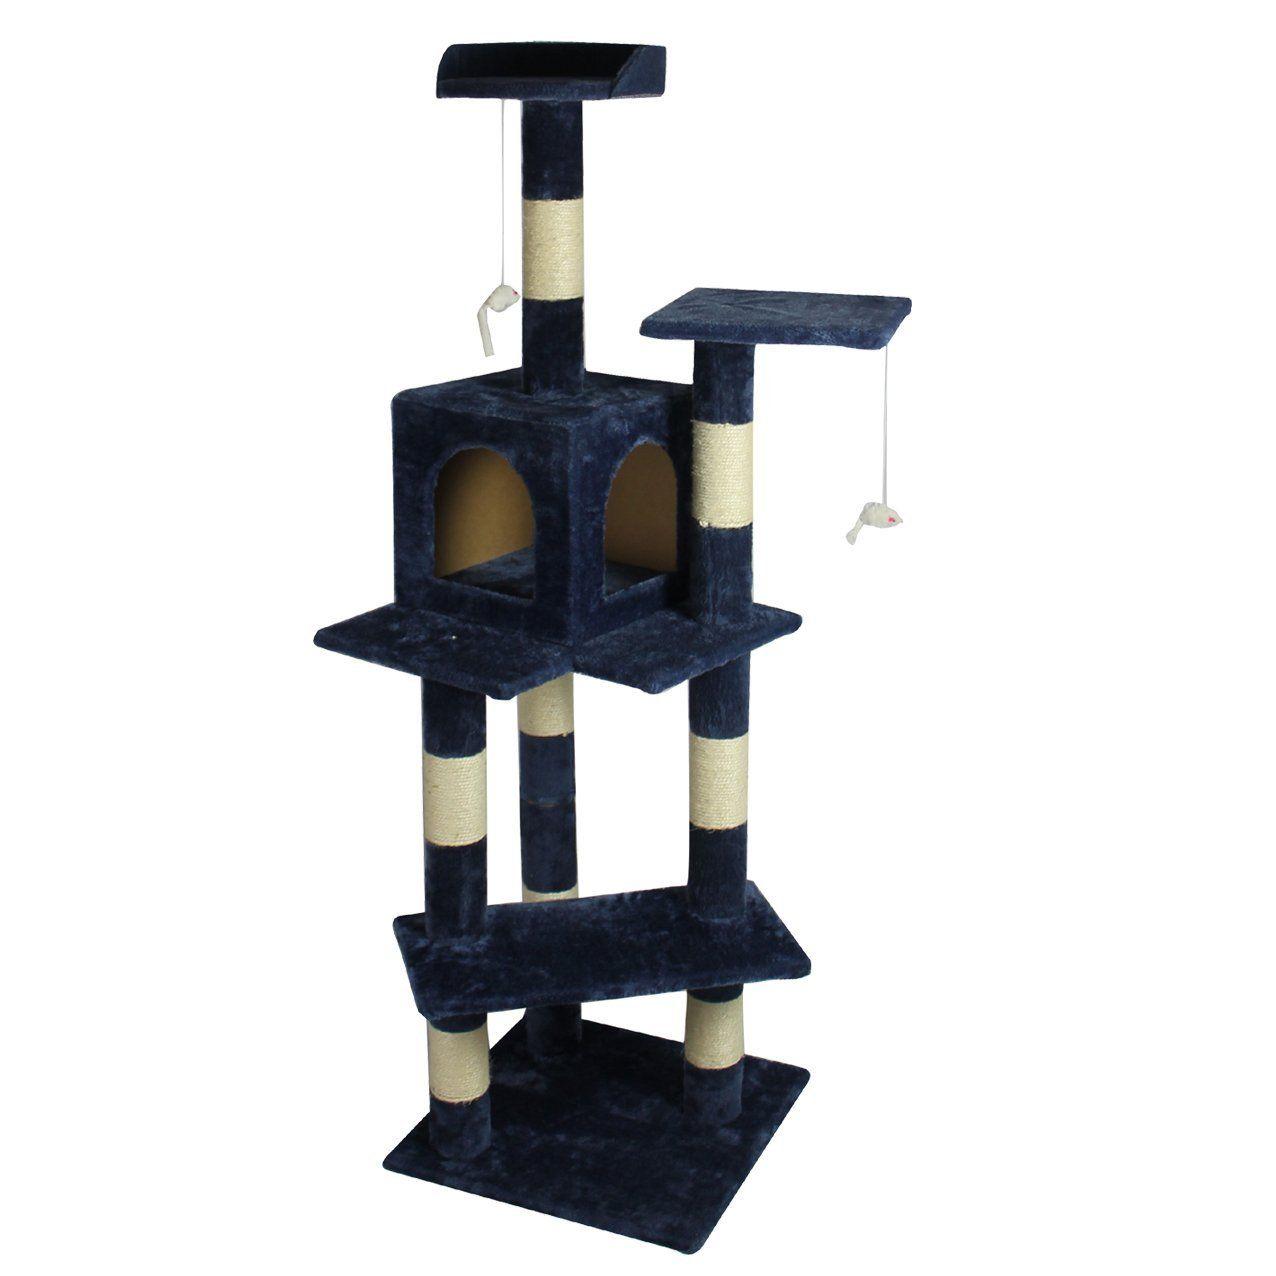 BestPet Cat Tree Condo Furniture Scratch Post Pet House, 60 Inch, Navy Blue